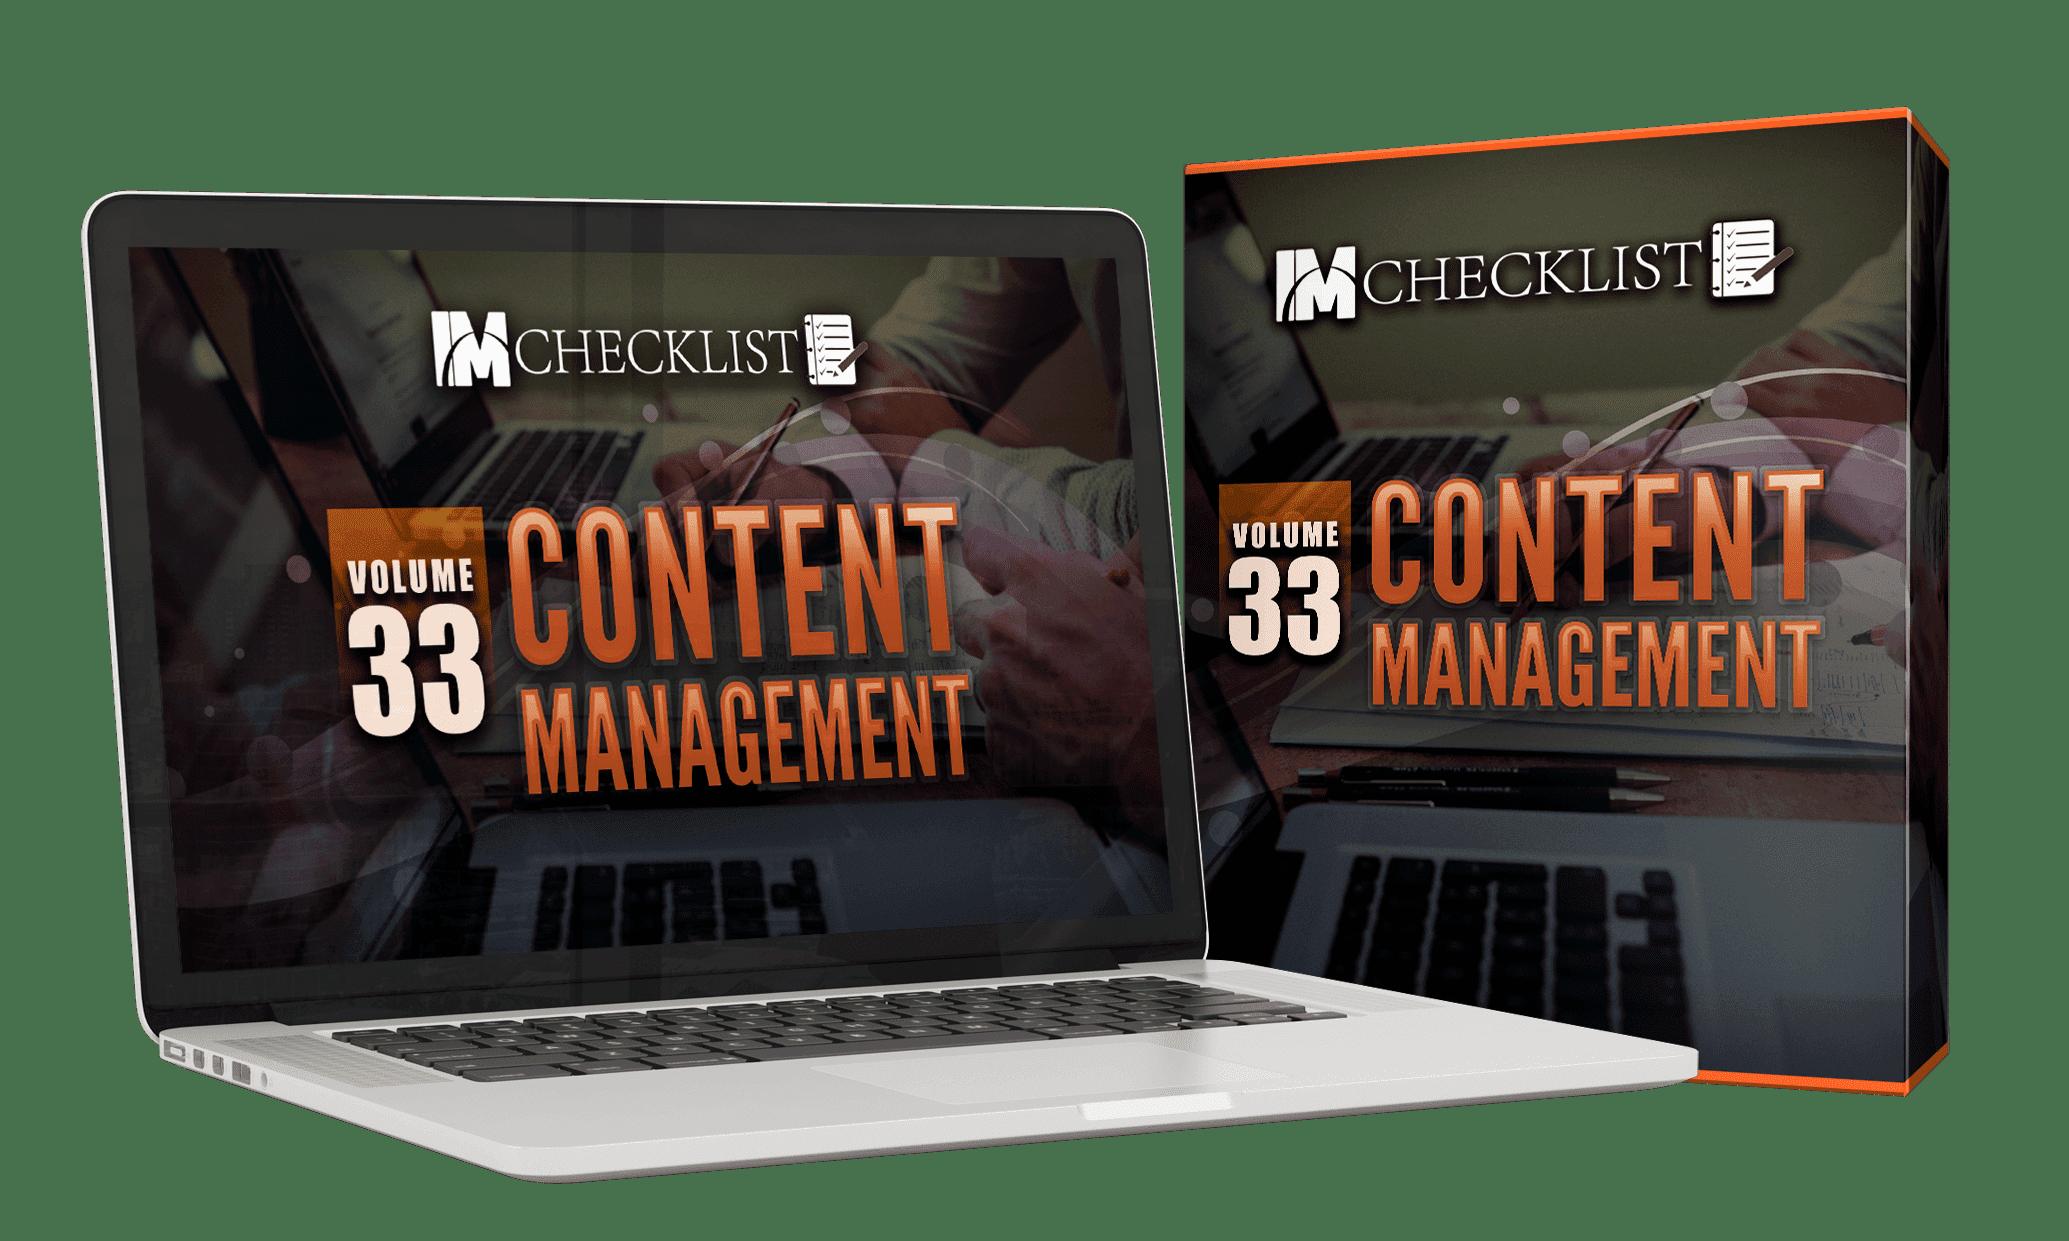 IM Checklist V33 Content Management